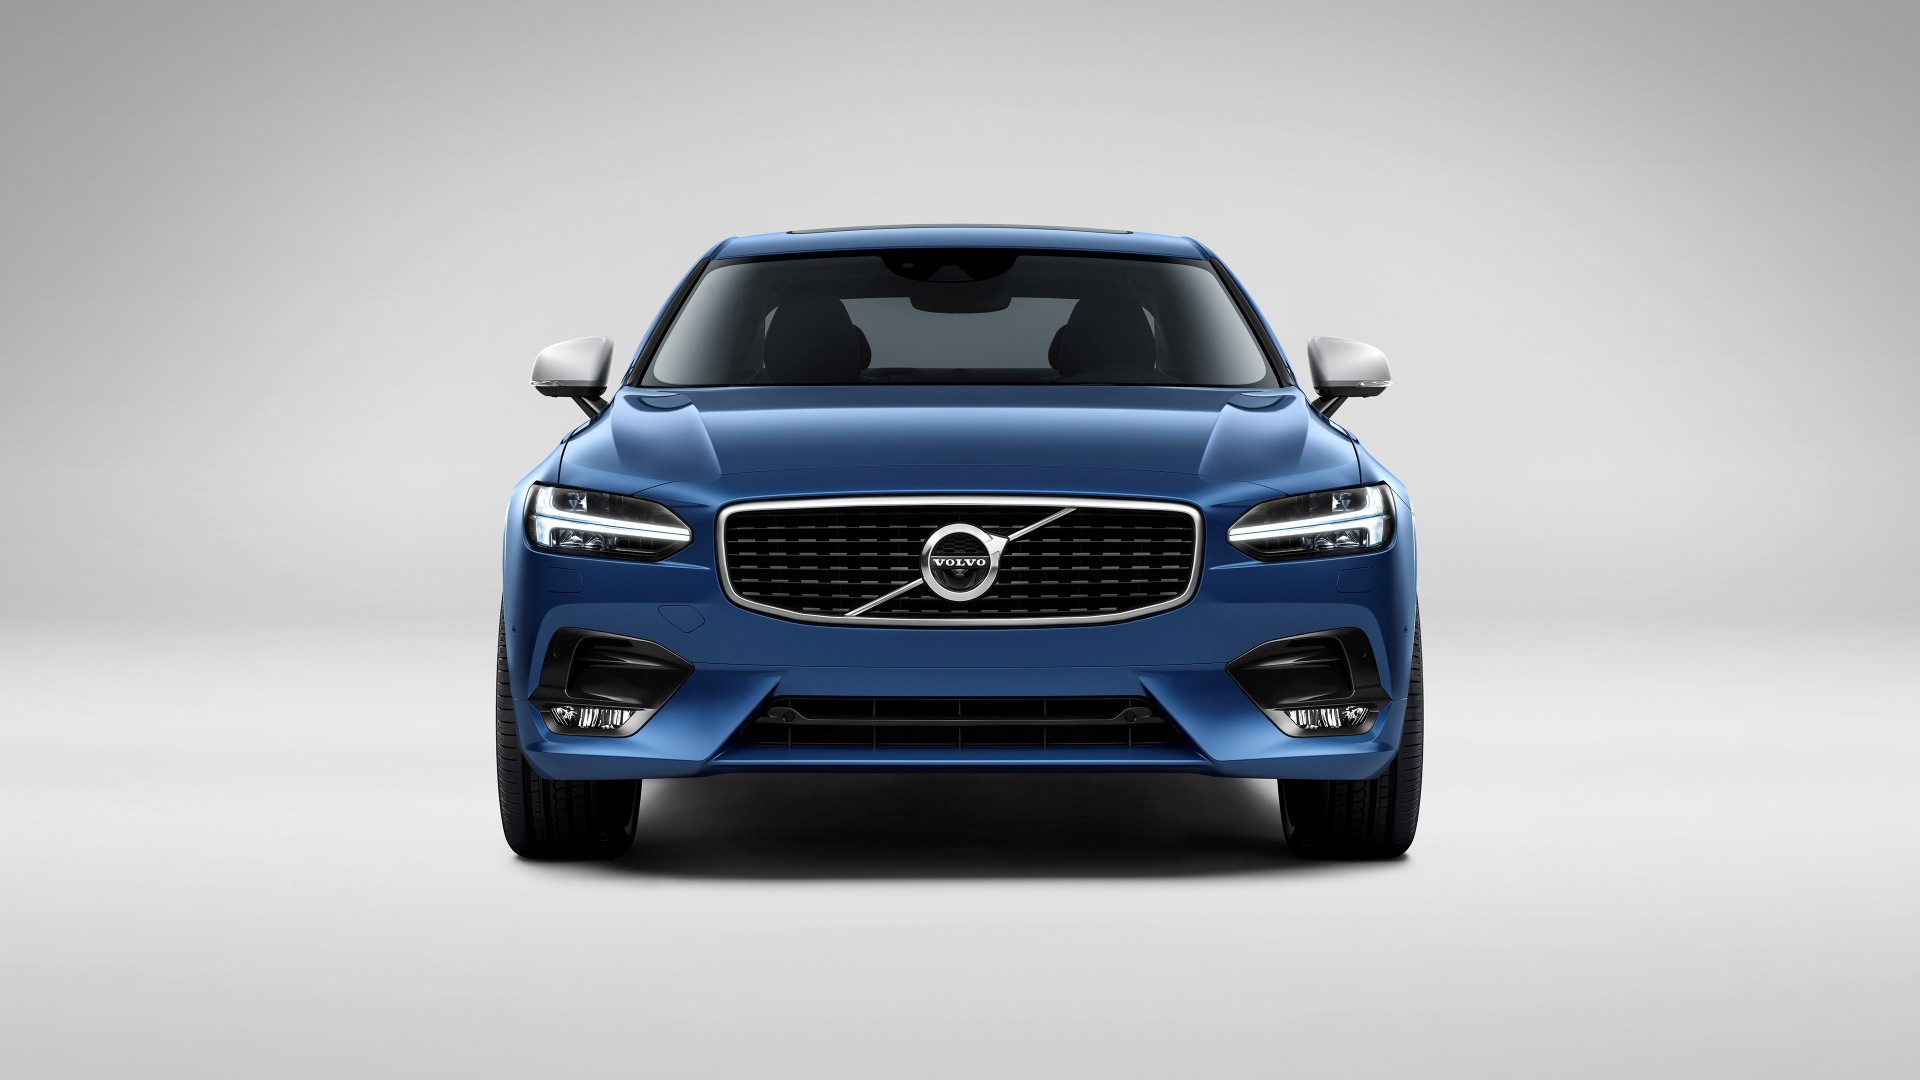 2016 Volvo V70 R 4k Wallpaper Hd Car Wallpapers Id 6685